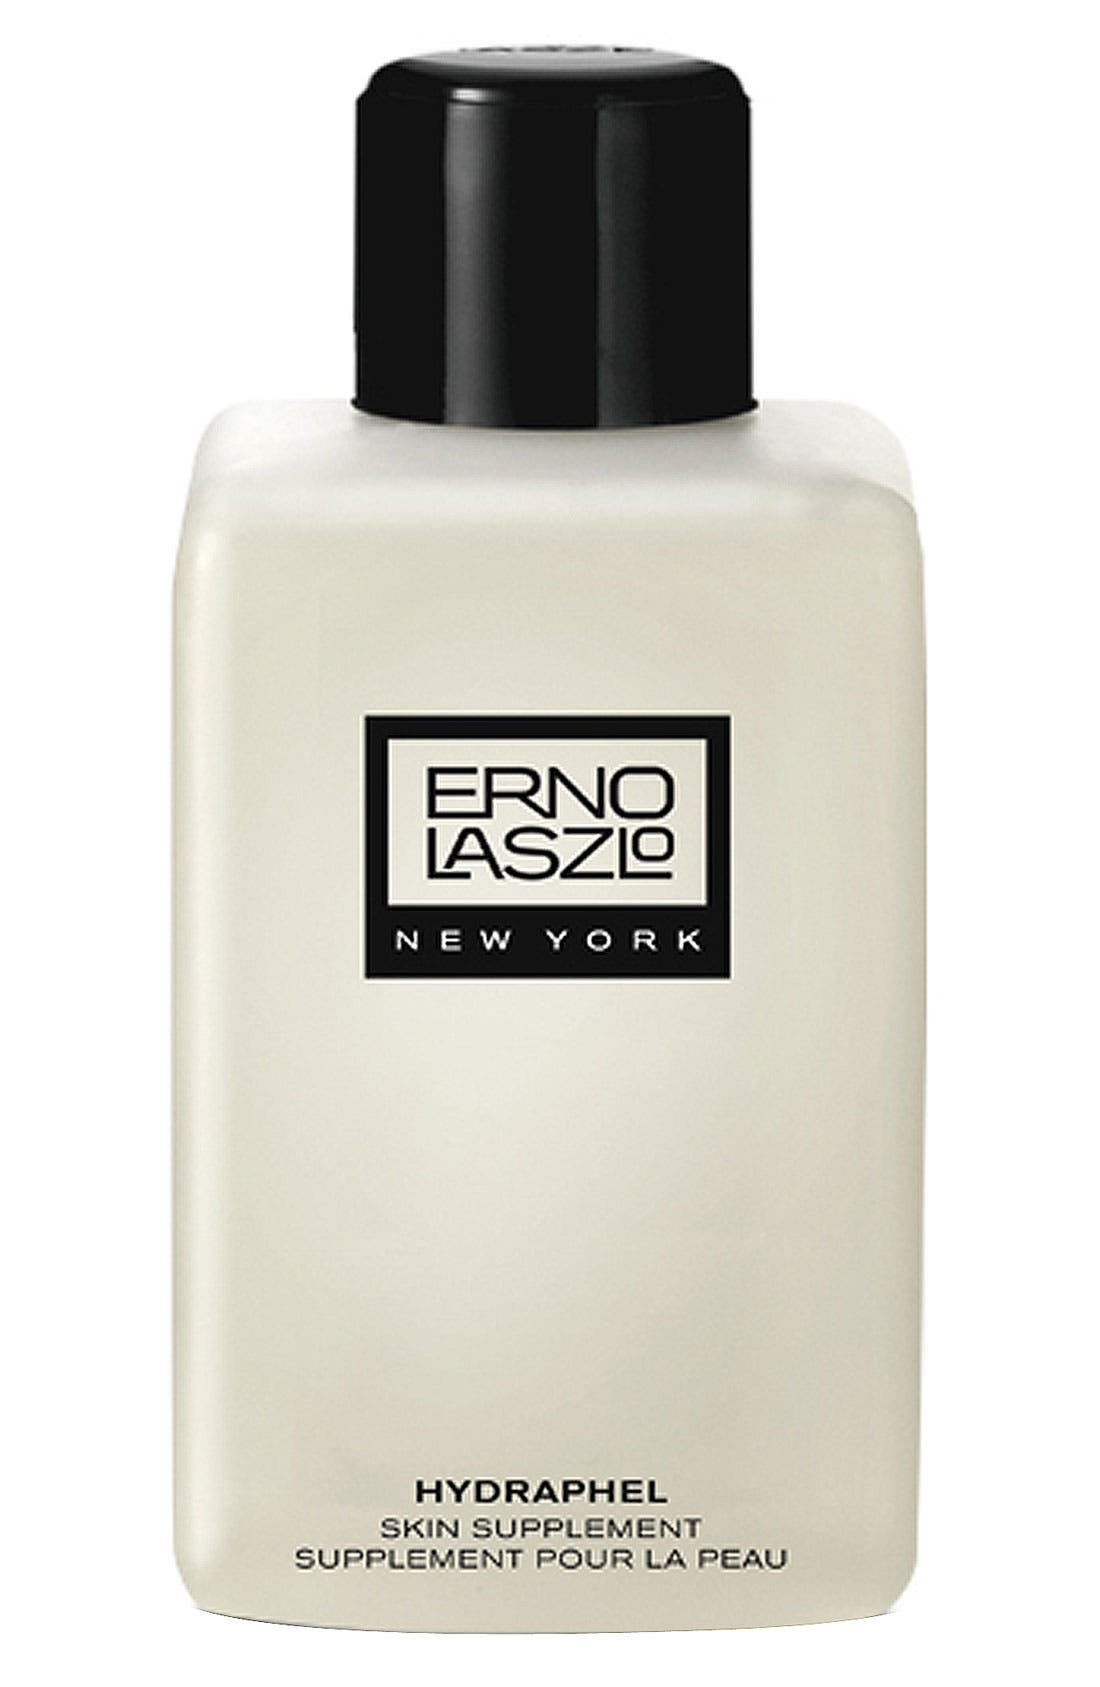 Erno Laszlo 'Hydraphel' Skin Supplement